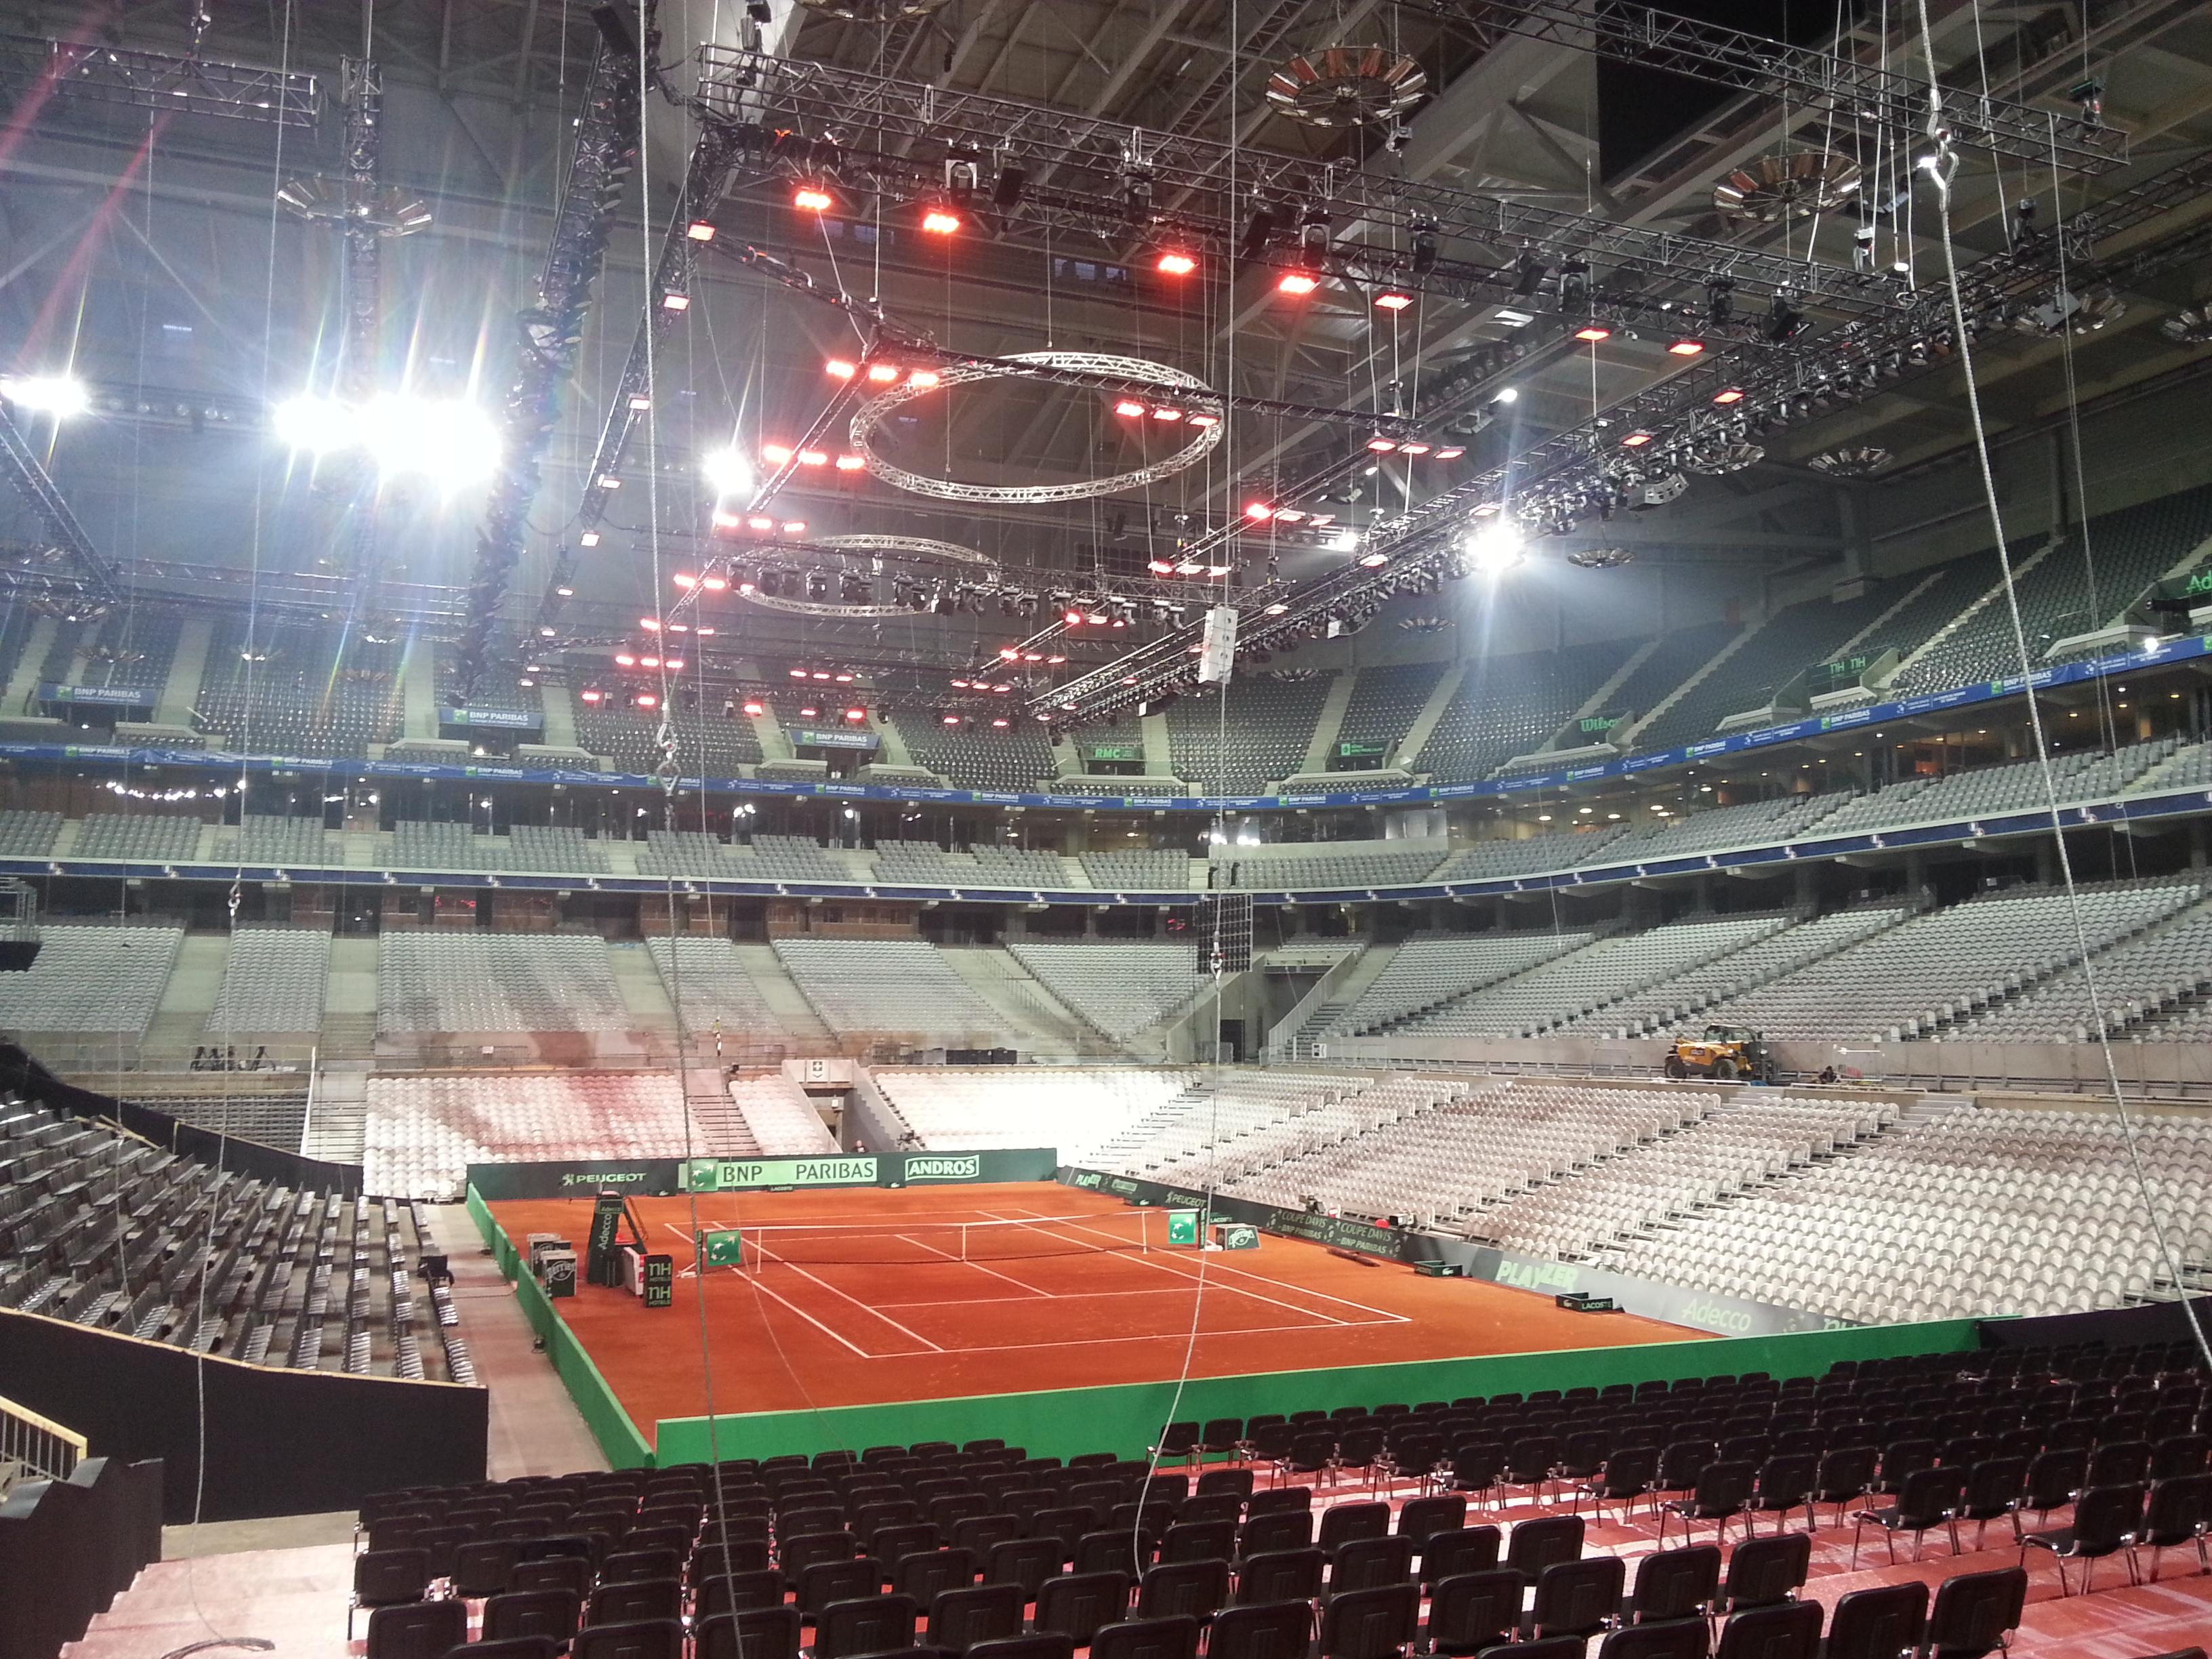 Infrarød varme i Davis Cup finalen